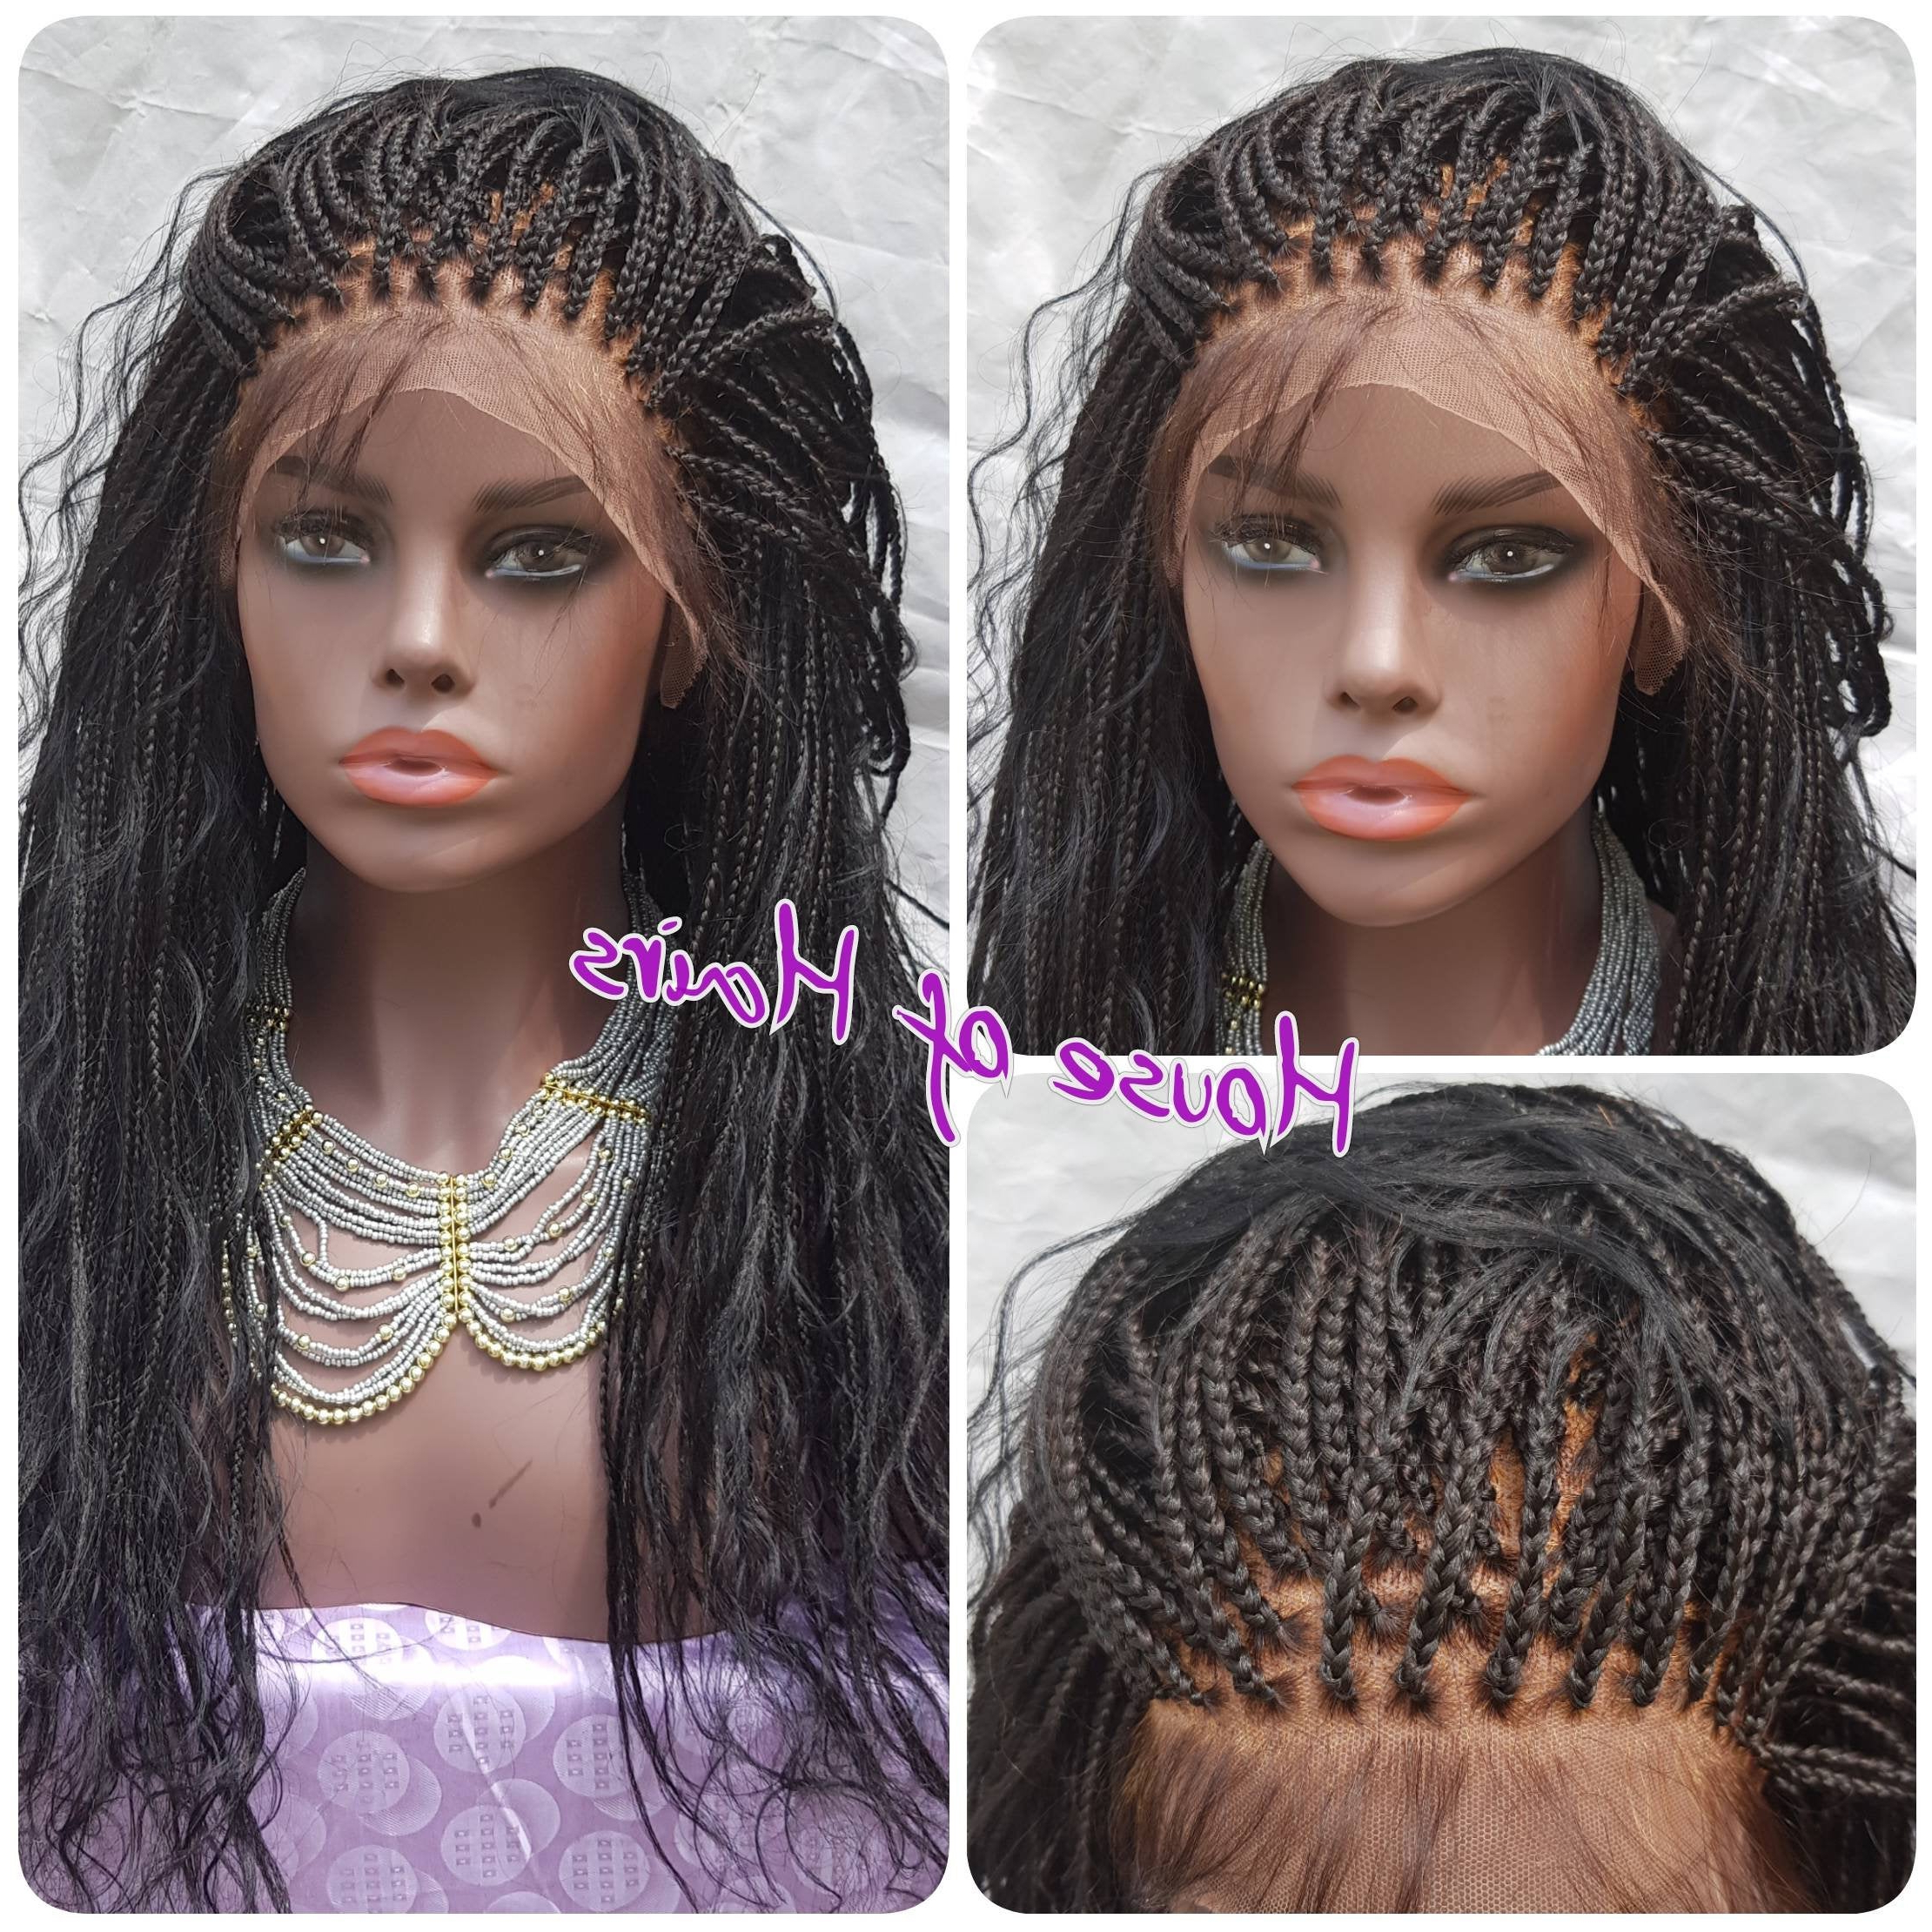 Handmade Glueless Boho Mermaid Braids Medium Box Braids 13X6 Within Well Known Mermaid'S Hairpiece Braid Hairstyles (View 8 of 20)